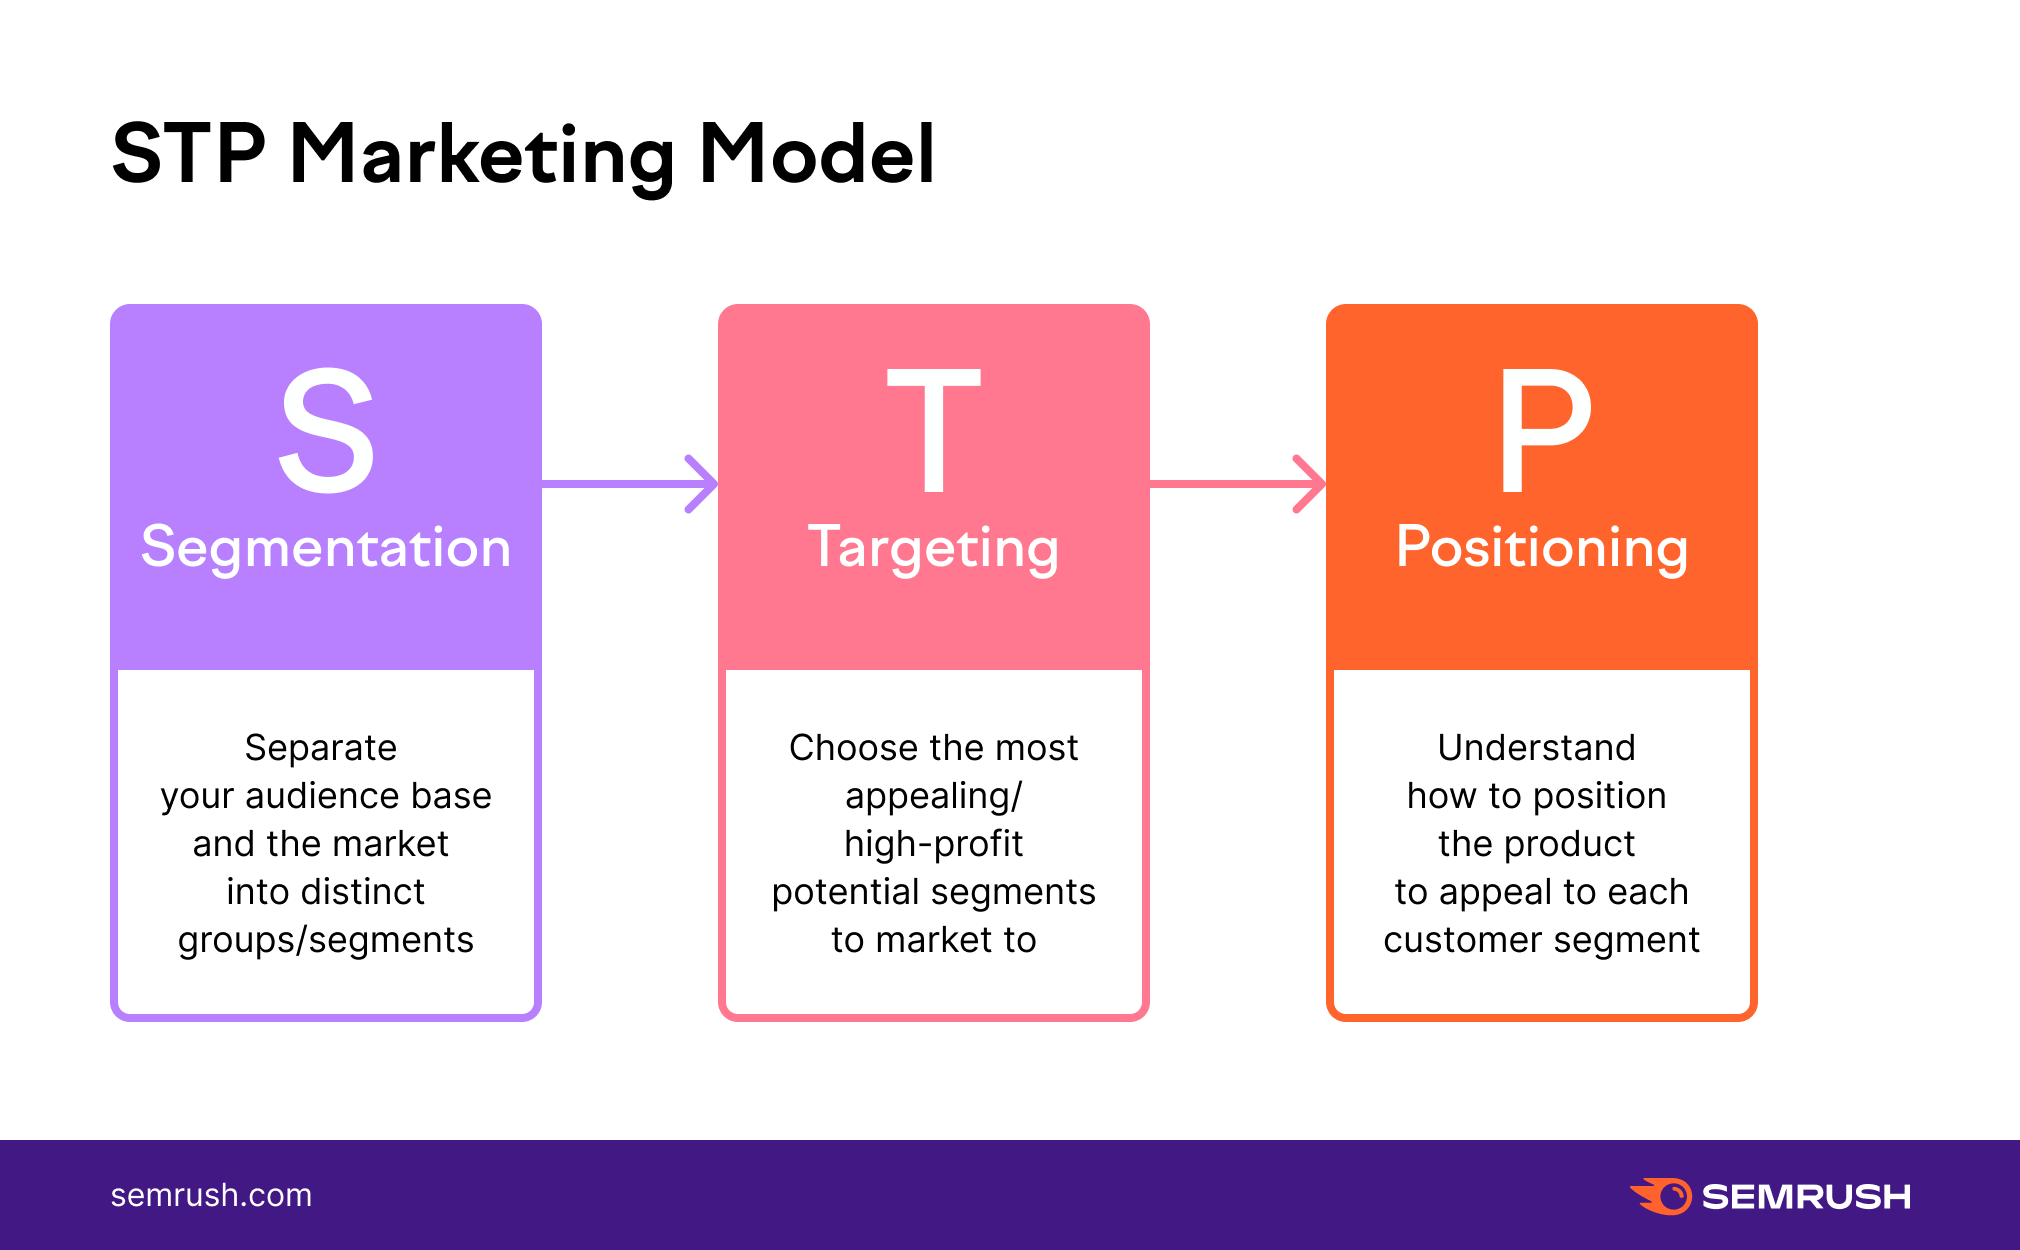 STP Marketing Model example